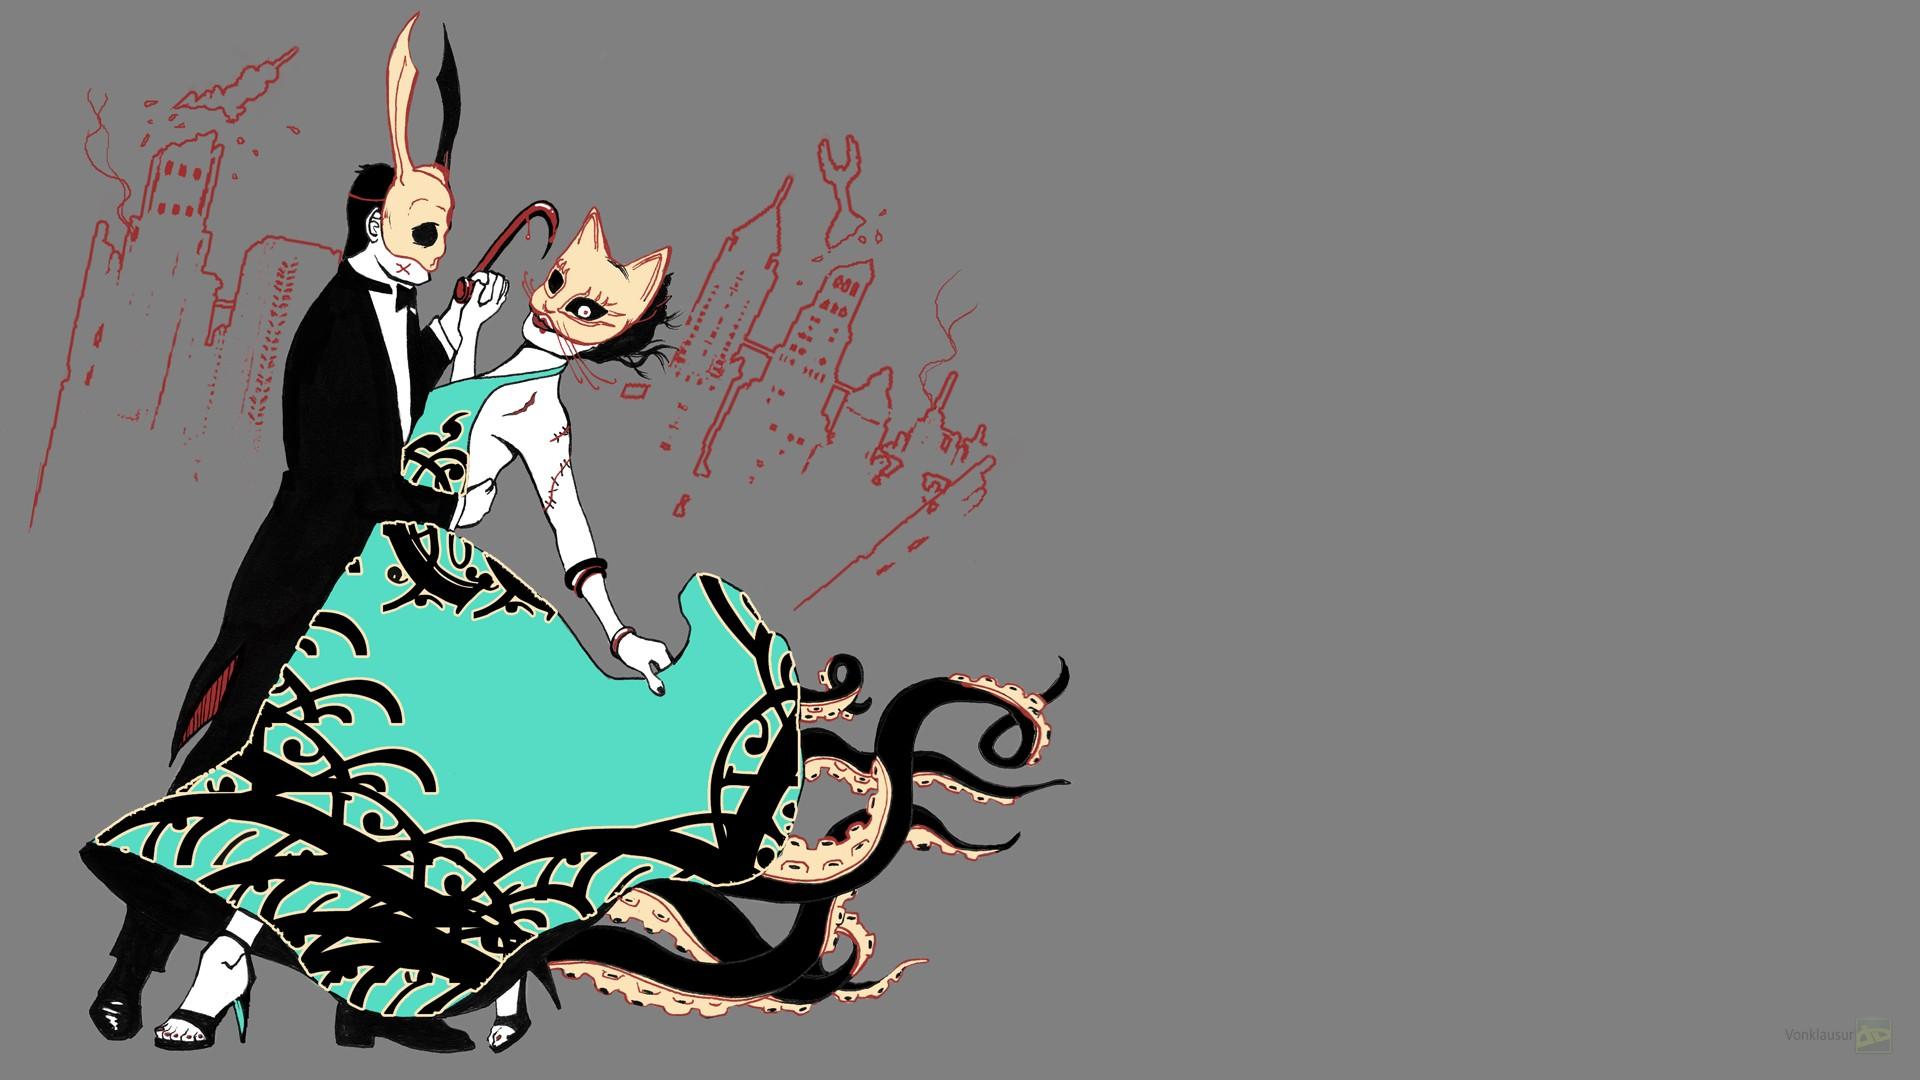 Wallpaper Illustration Graphic Design Roar Movie: Masaüstü : Illüstrasyon, Dans, Maske, Karikatür, Grafik